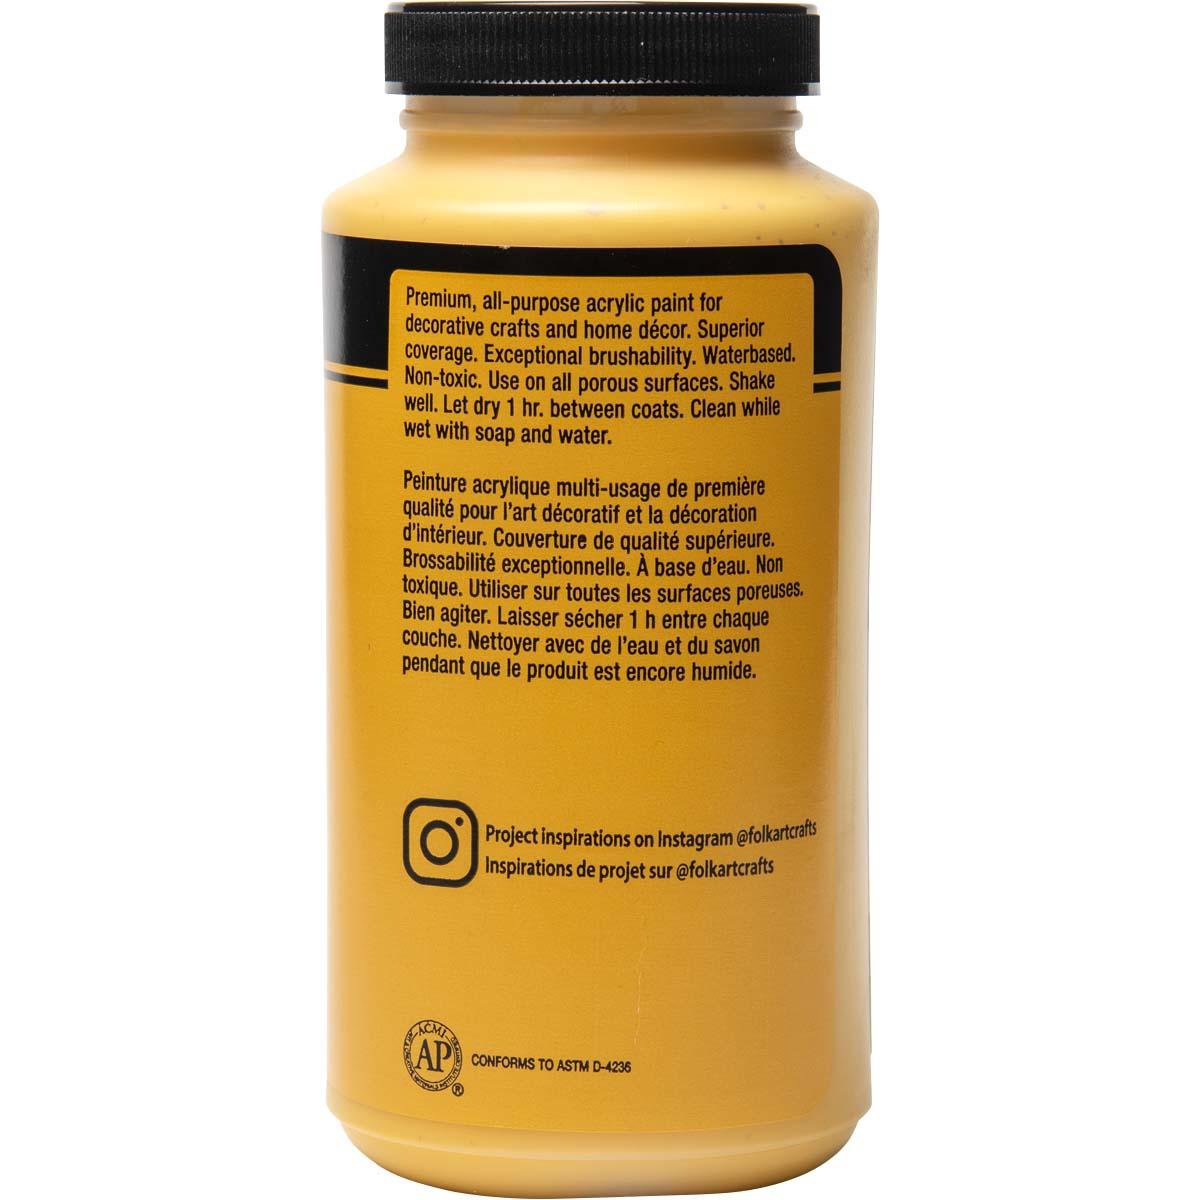 FolkArt ® Acrylic Colors - School Bus Yellow, 16 oz. - 6366